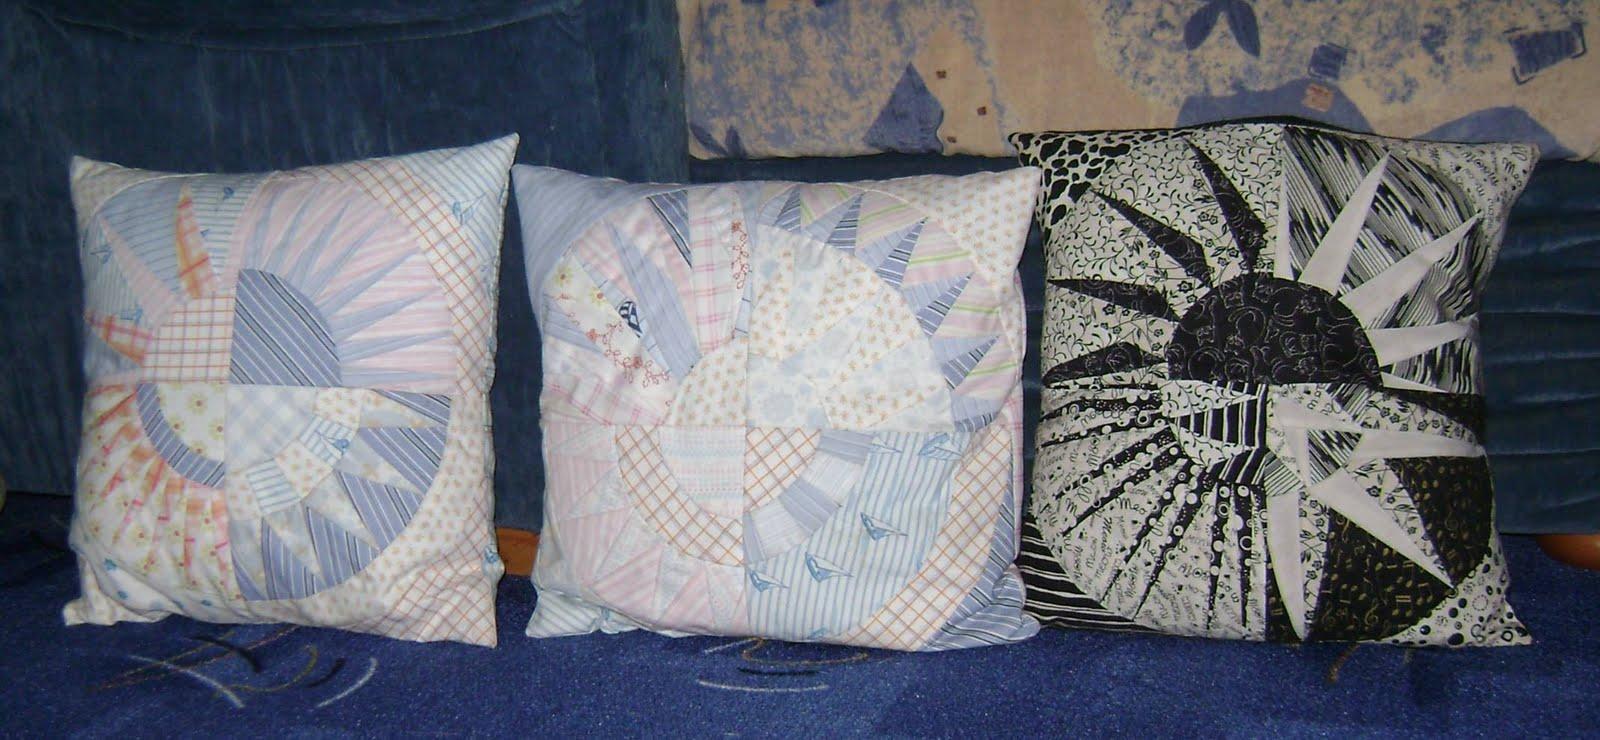 patchwork handarbeit enga s welt nyb kissen. Black Bedroom Furniture Sets. Home Design Ideas